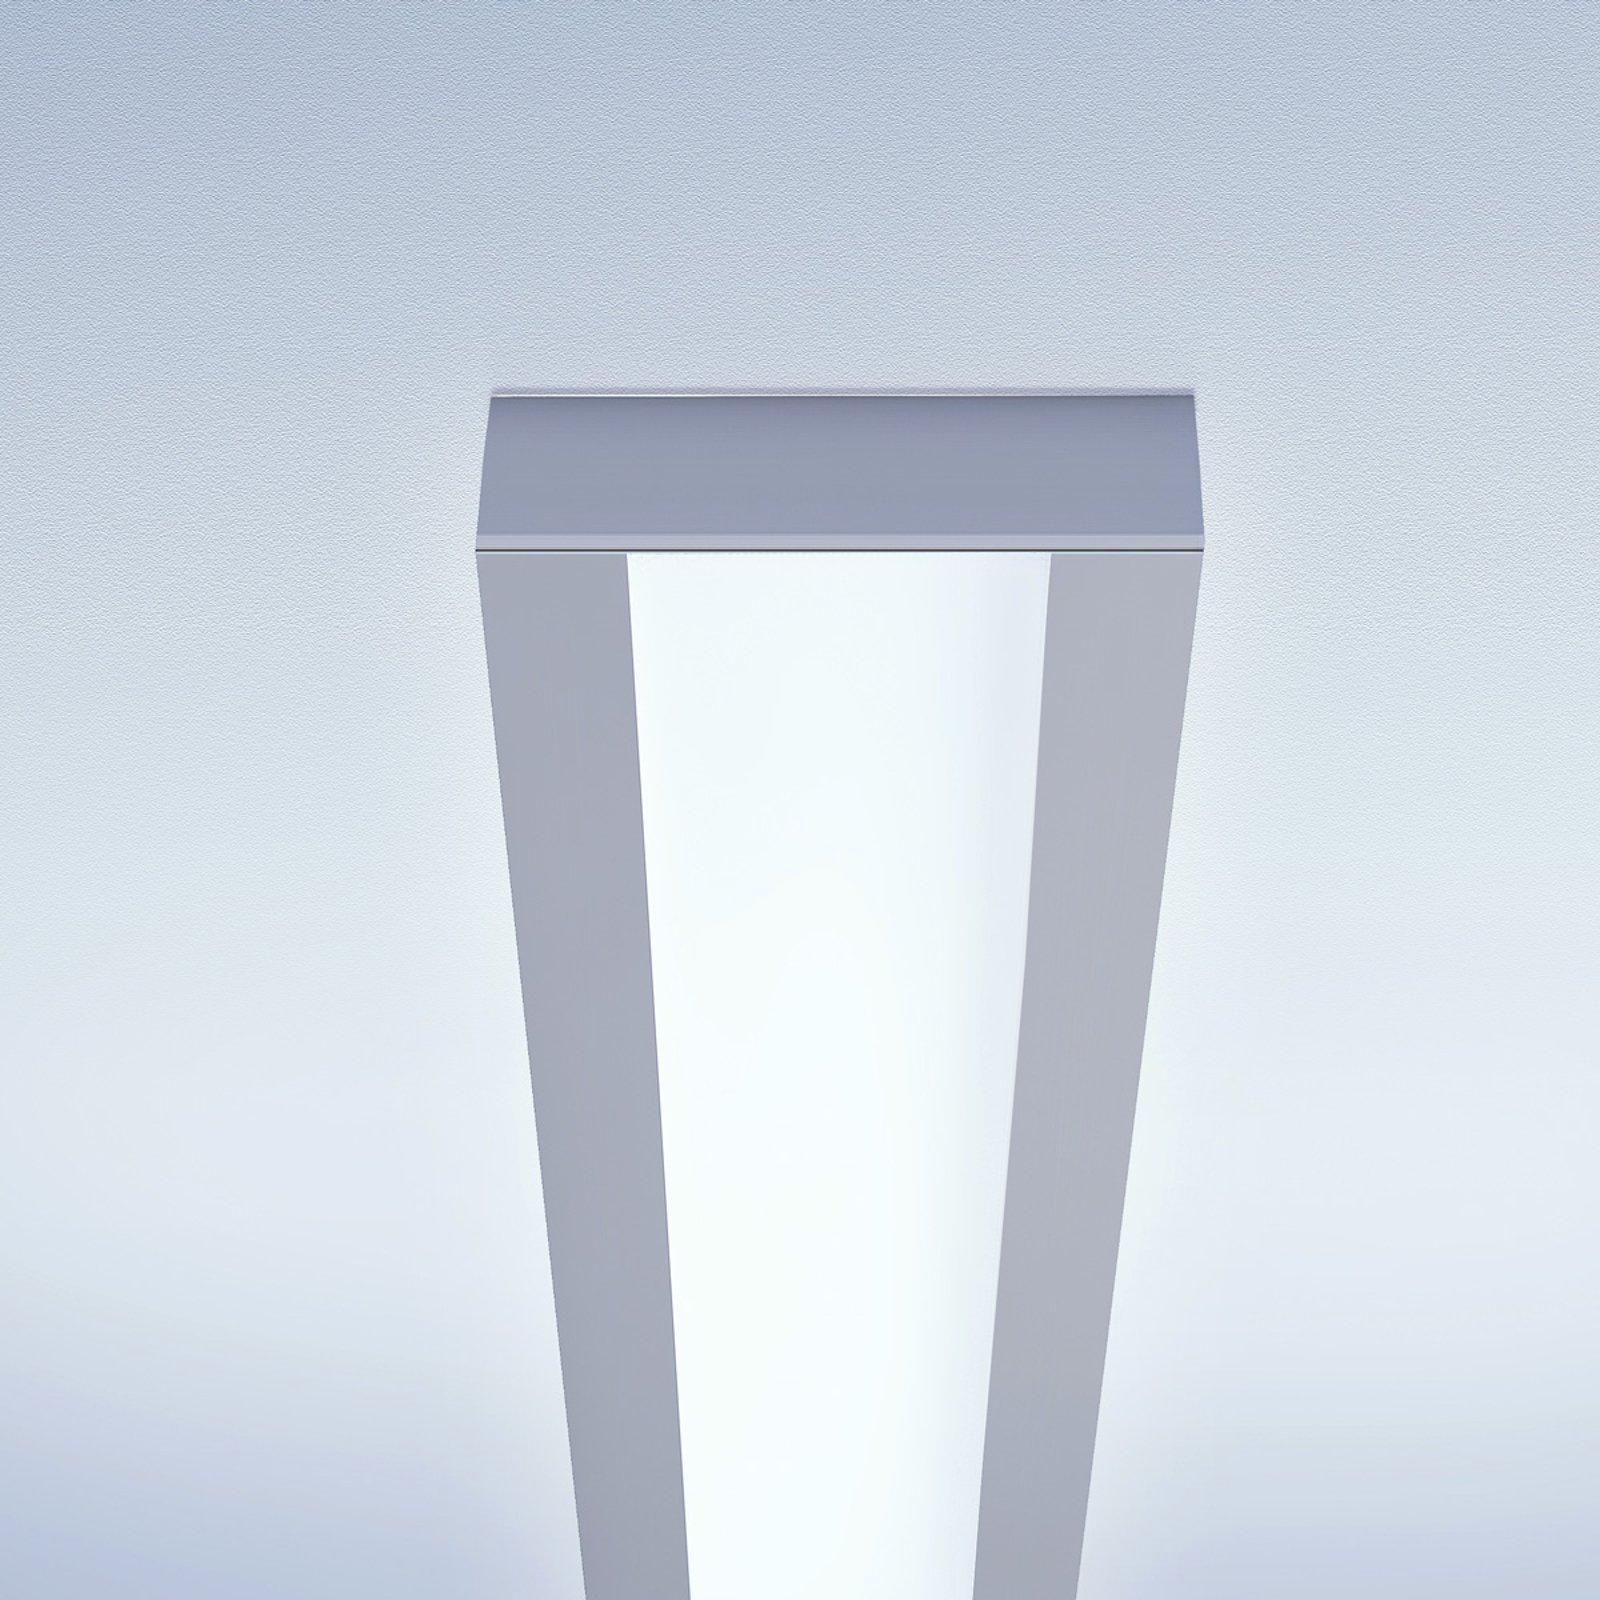 Vision-A2 utenpåliggende taklampe LED 293 cm